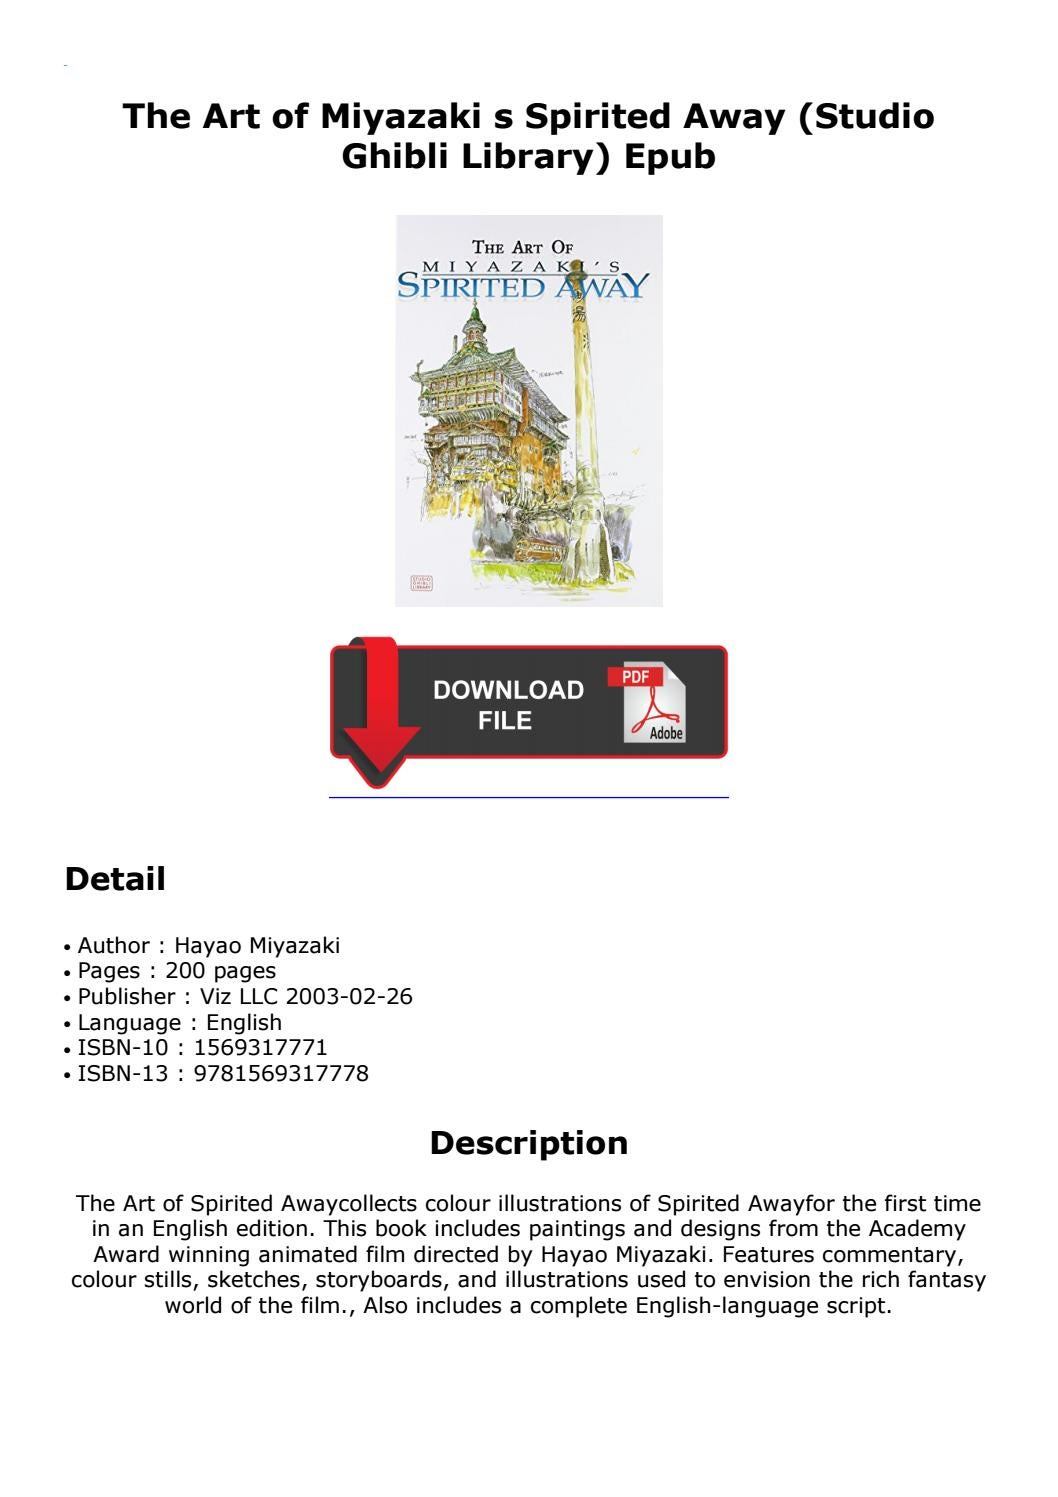 The Art Of Miyazaki S Spirited Away Studio Ghibli Library Epub By Dobroslawerfe Issuu